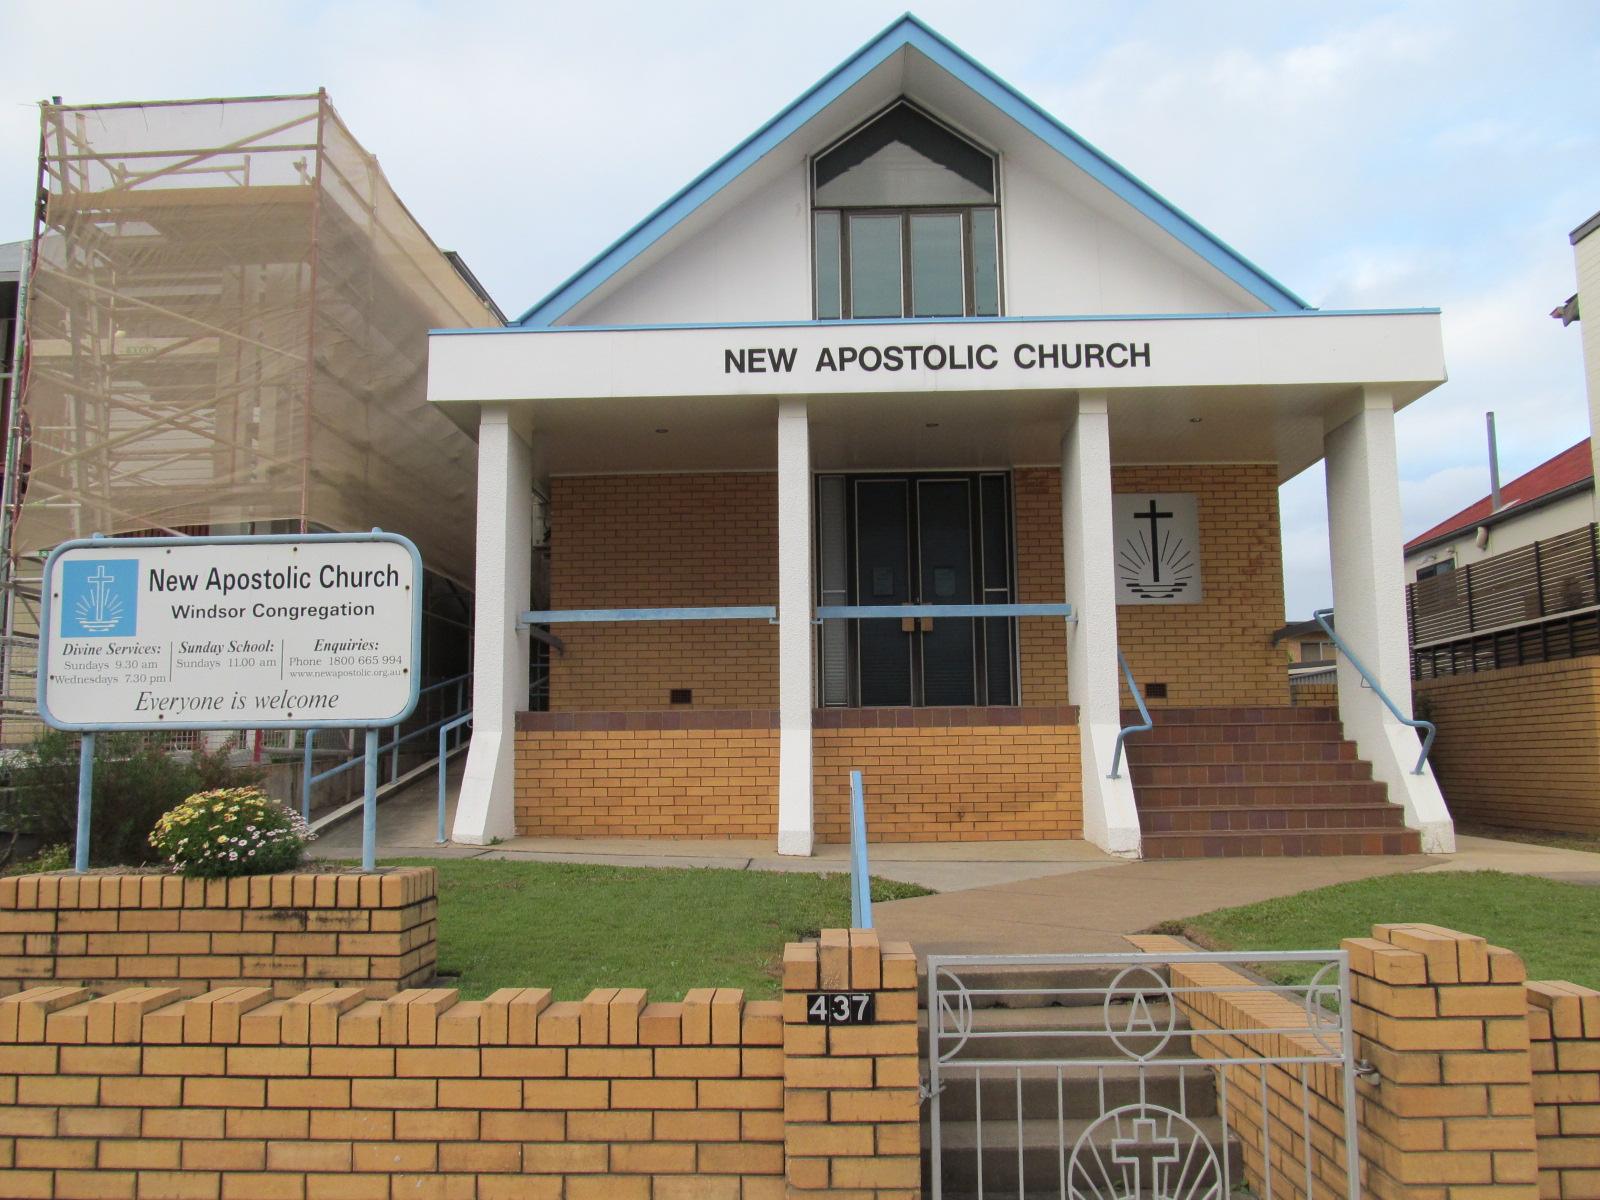 File:Windsor new apostolic church jpg - Wikimedia Commons